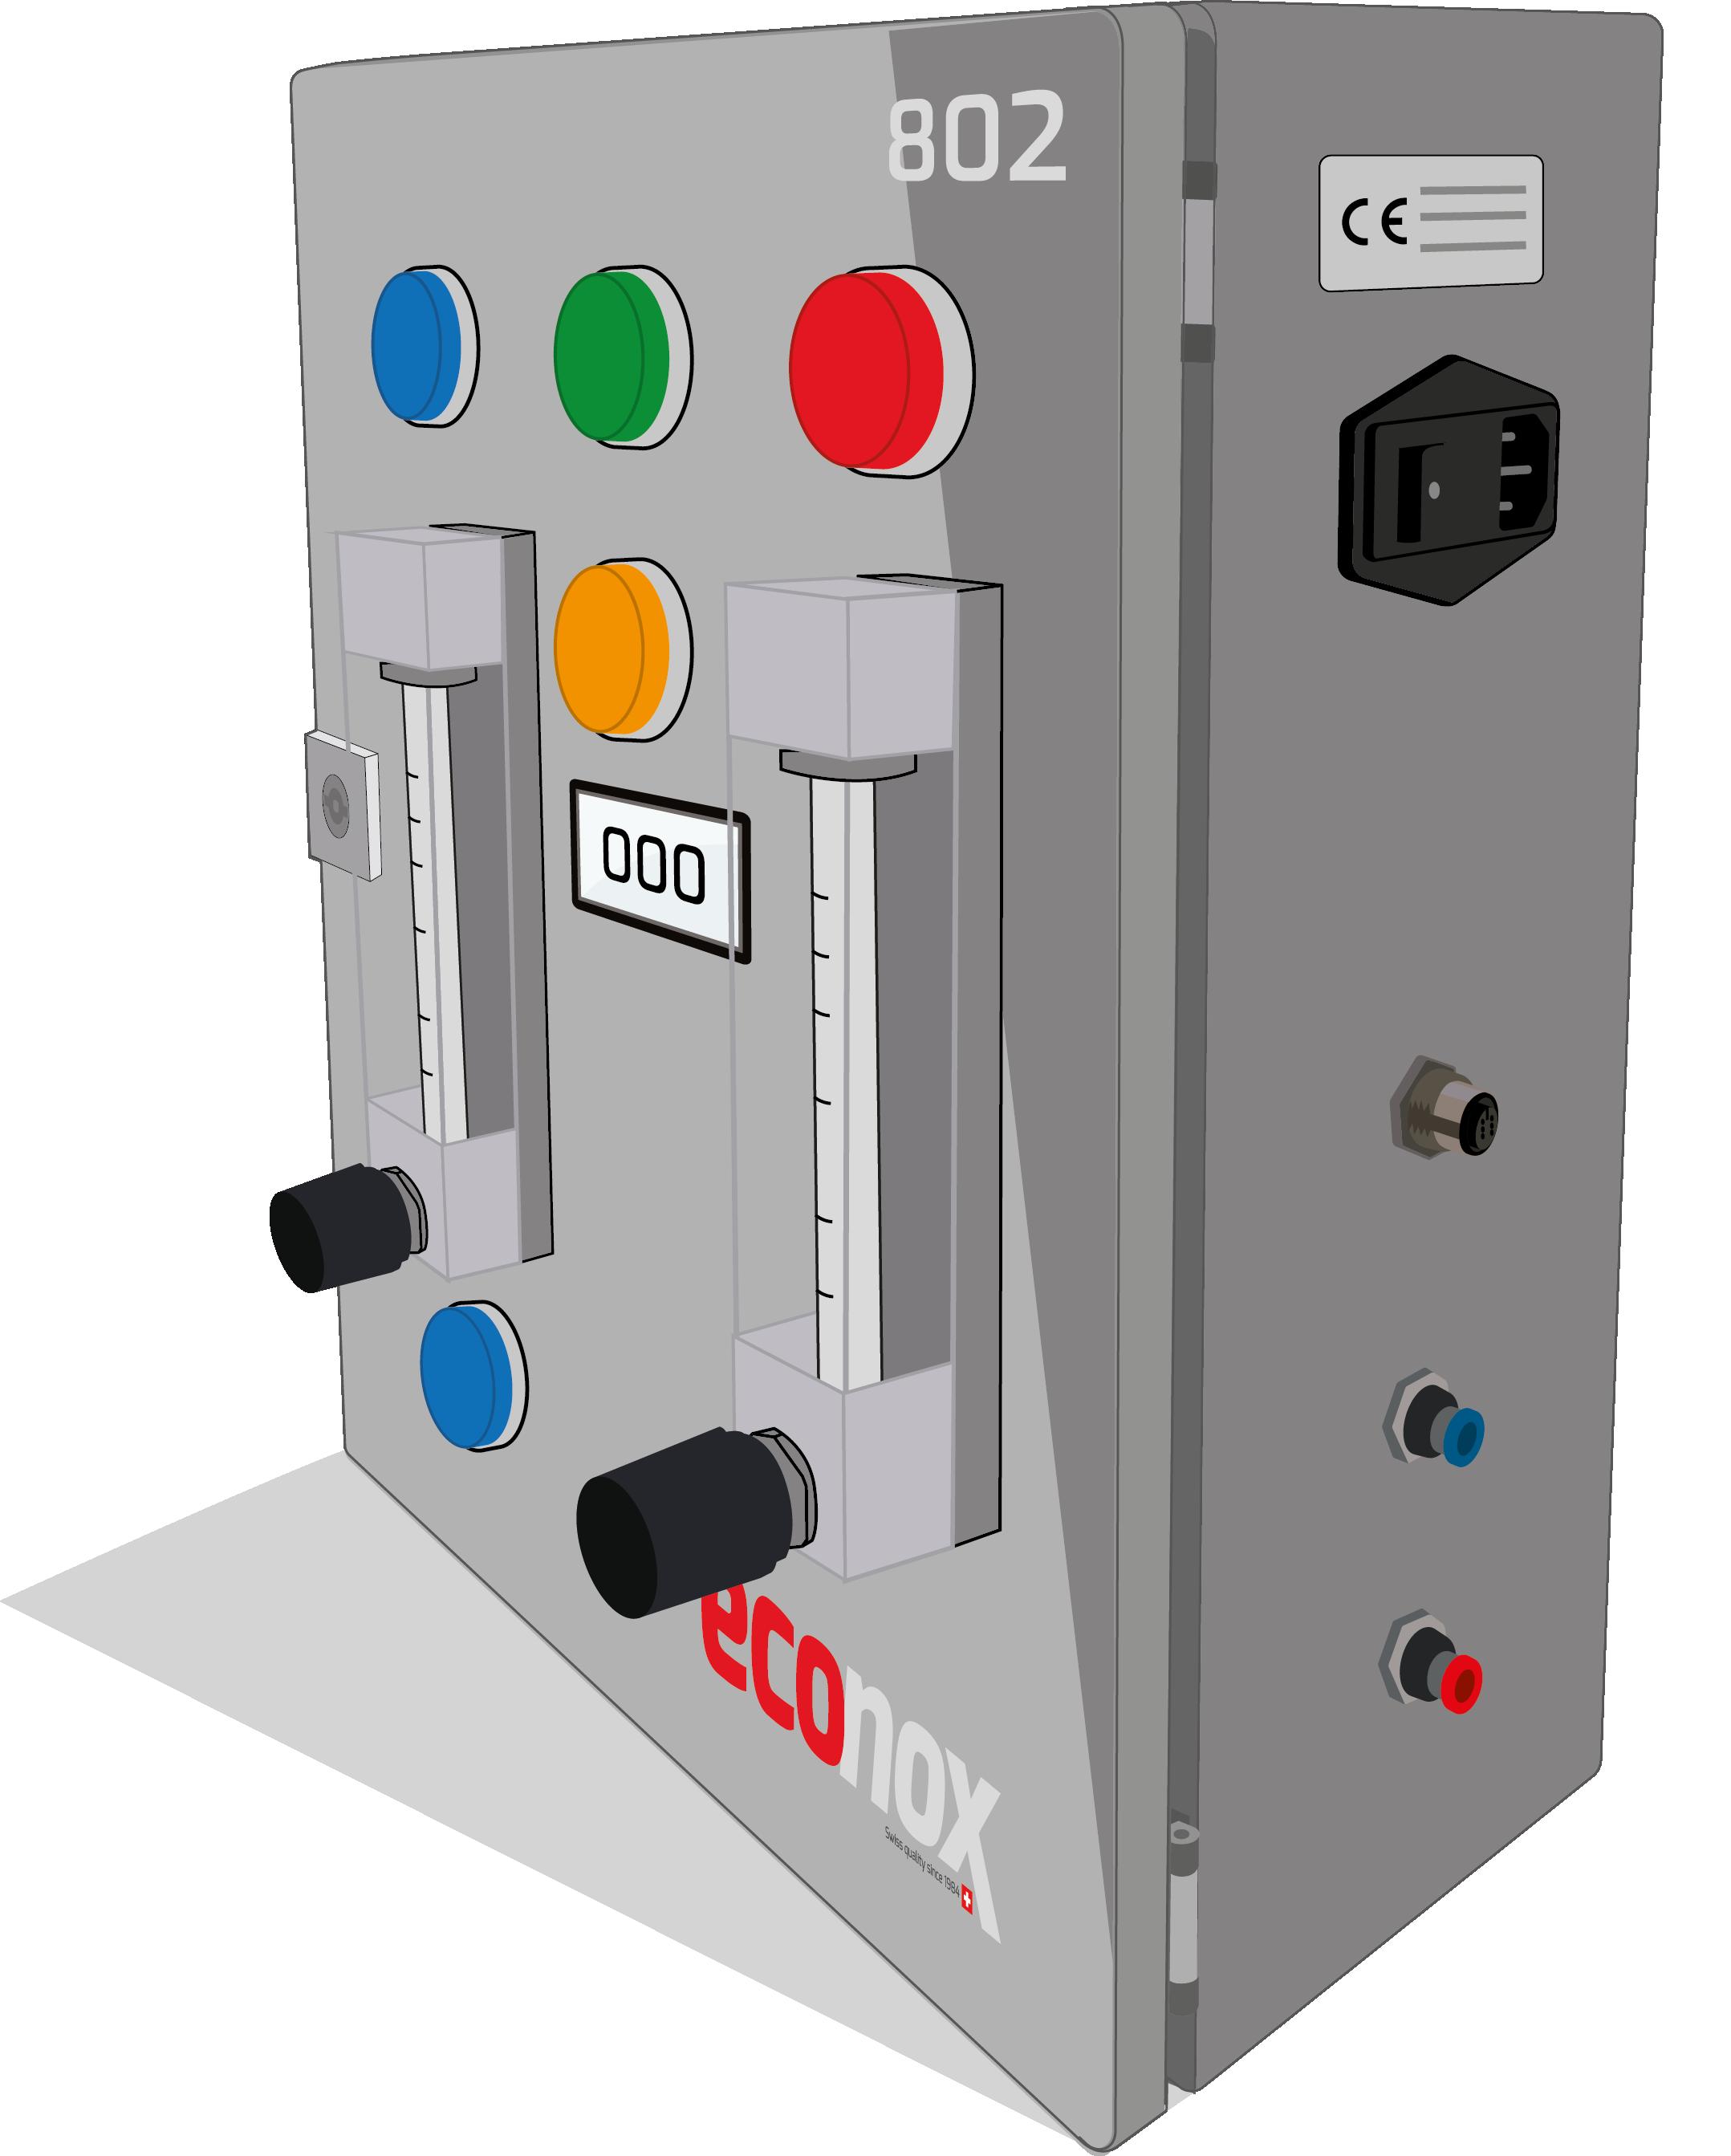 Maintenance Module 802